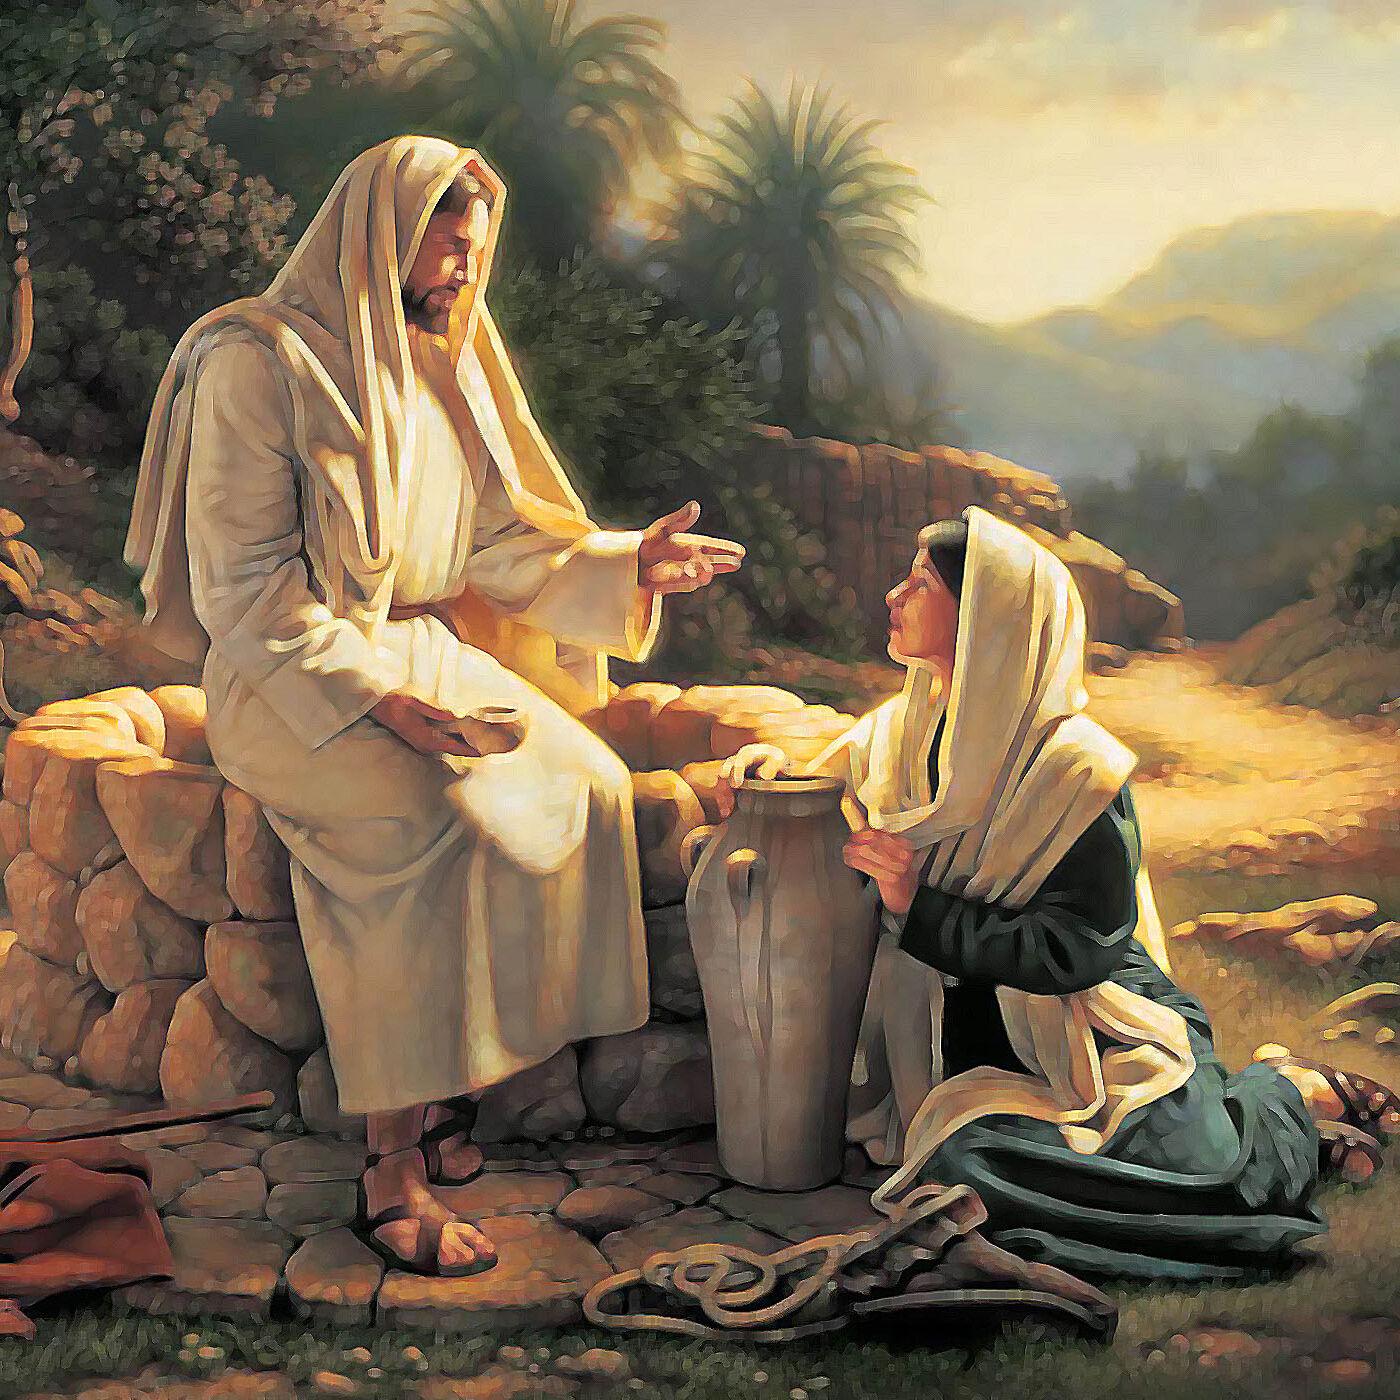 riflessioni sul Vangelo di Martedì 30 Marzo 2021 (Gv 13, 21-33. 36-38) - Apostola Loredana